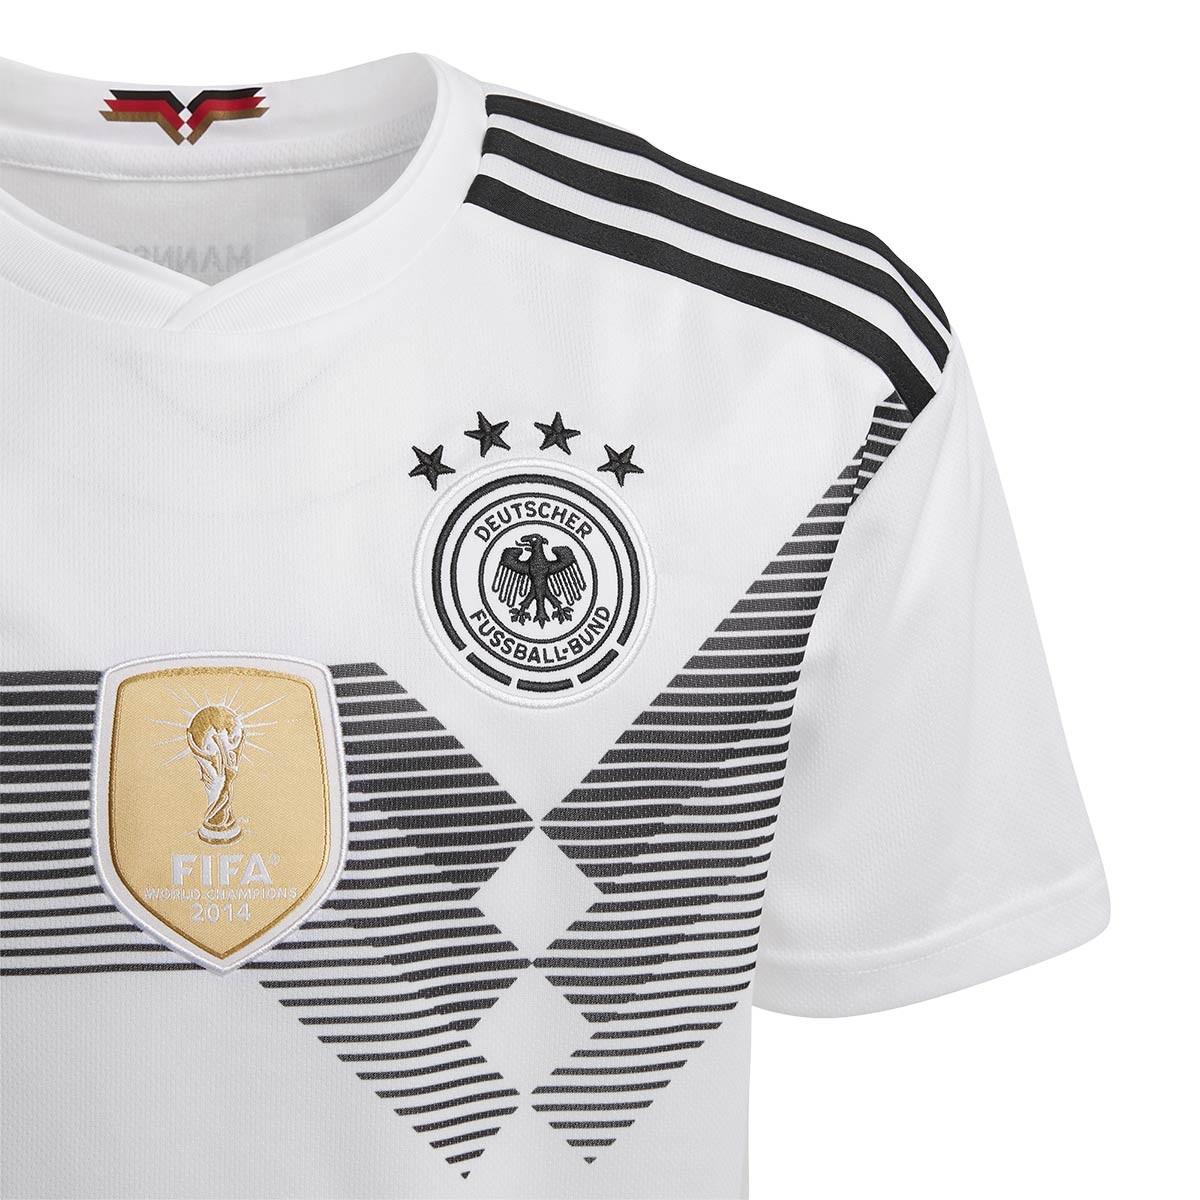 44acf2aeb Jersey adidas Kids Germany 2017-2018 Home White-Black - Football store  Fútbol Emotion